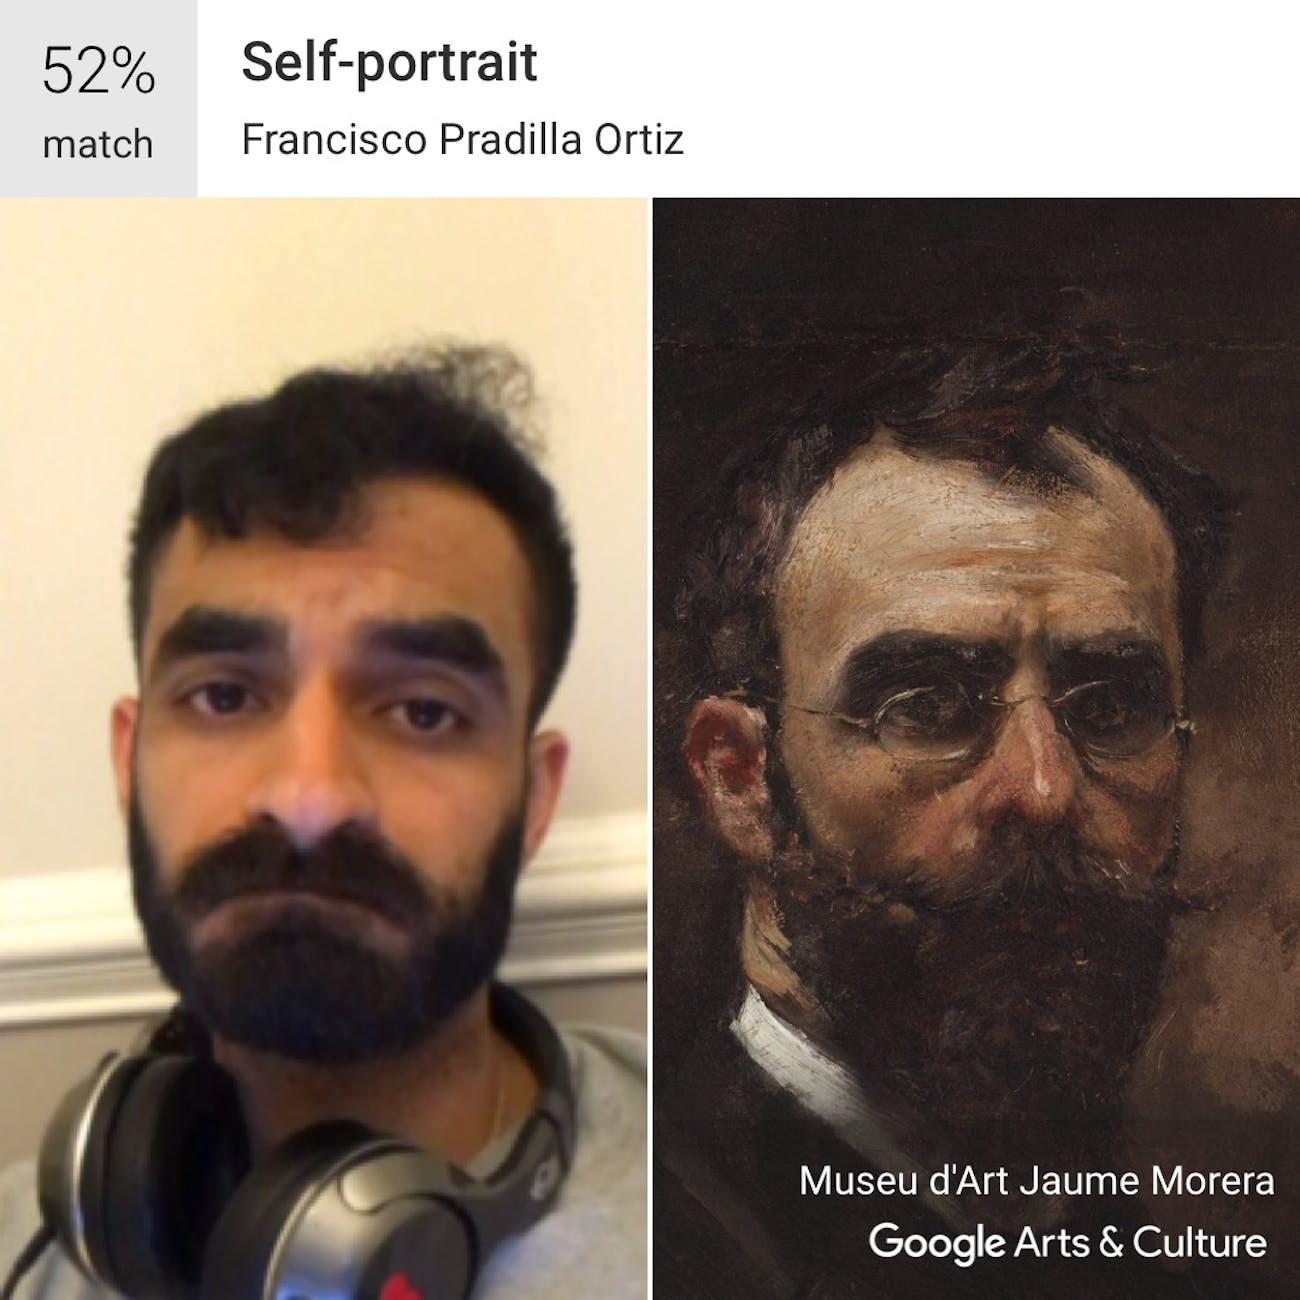 google arts and cutlure app